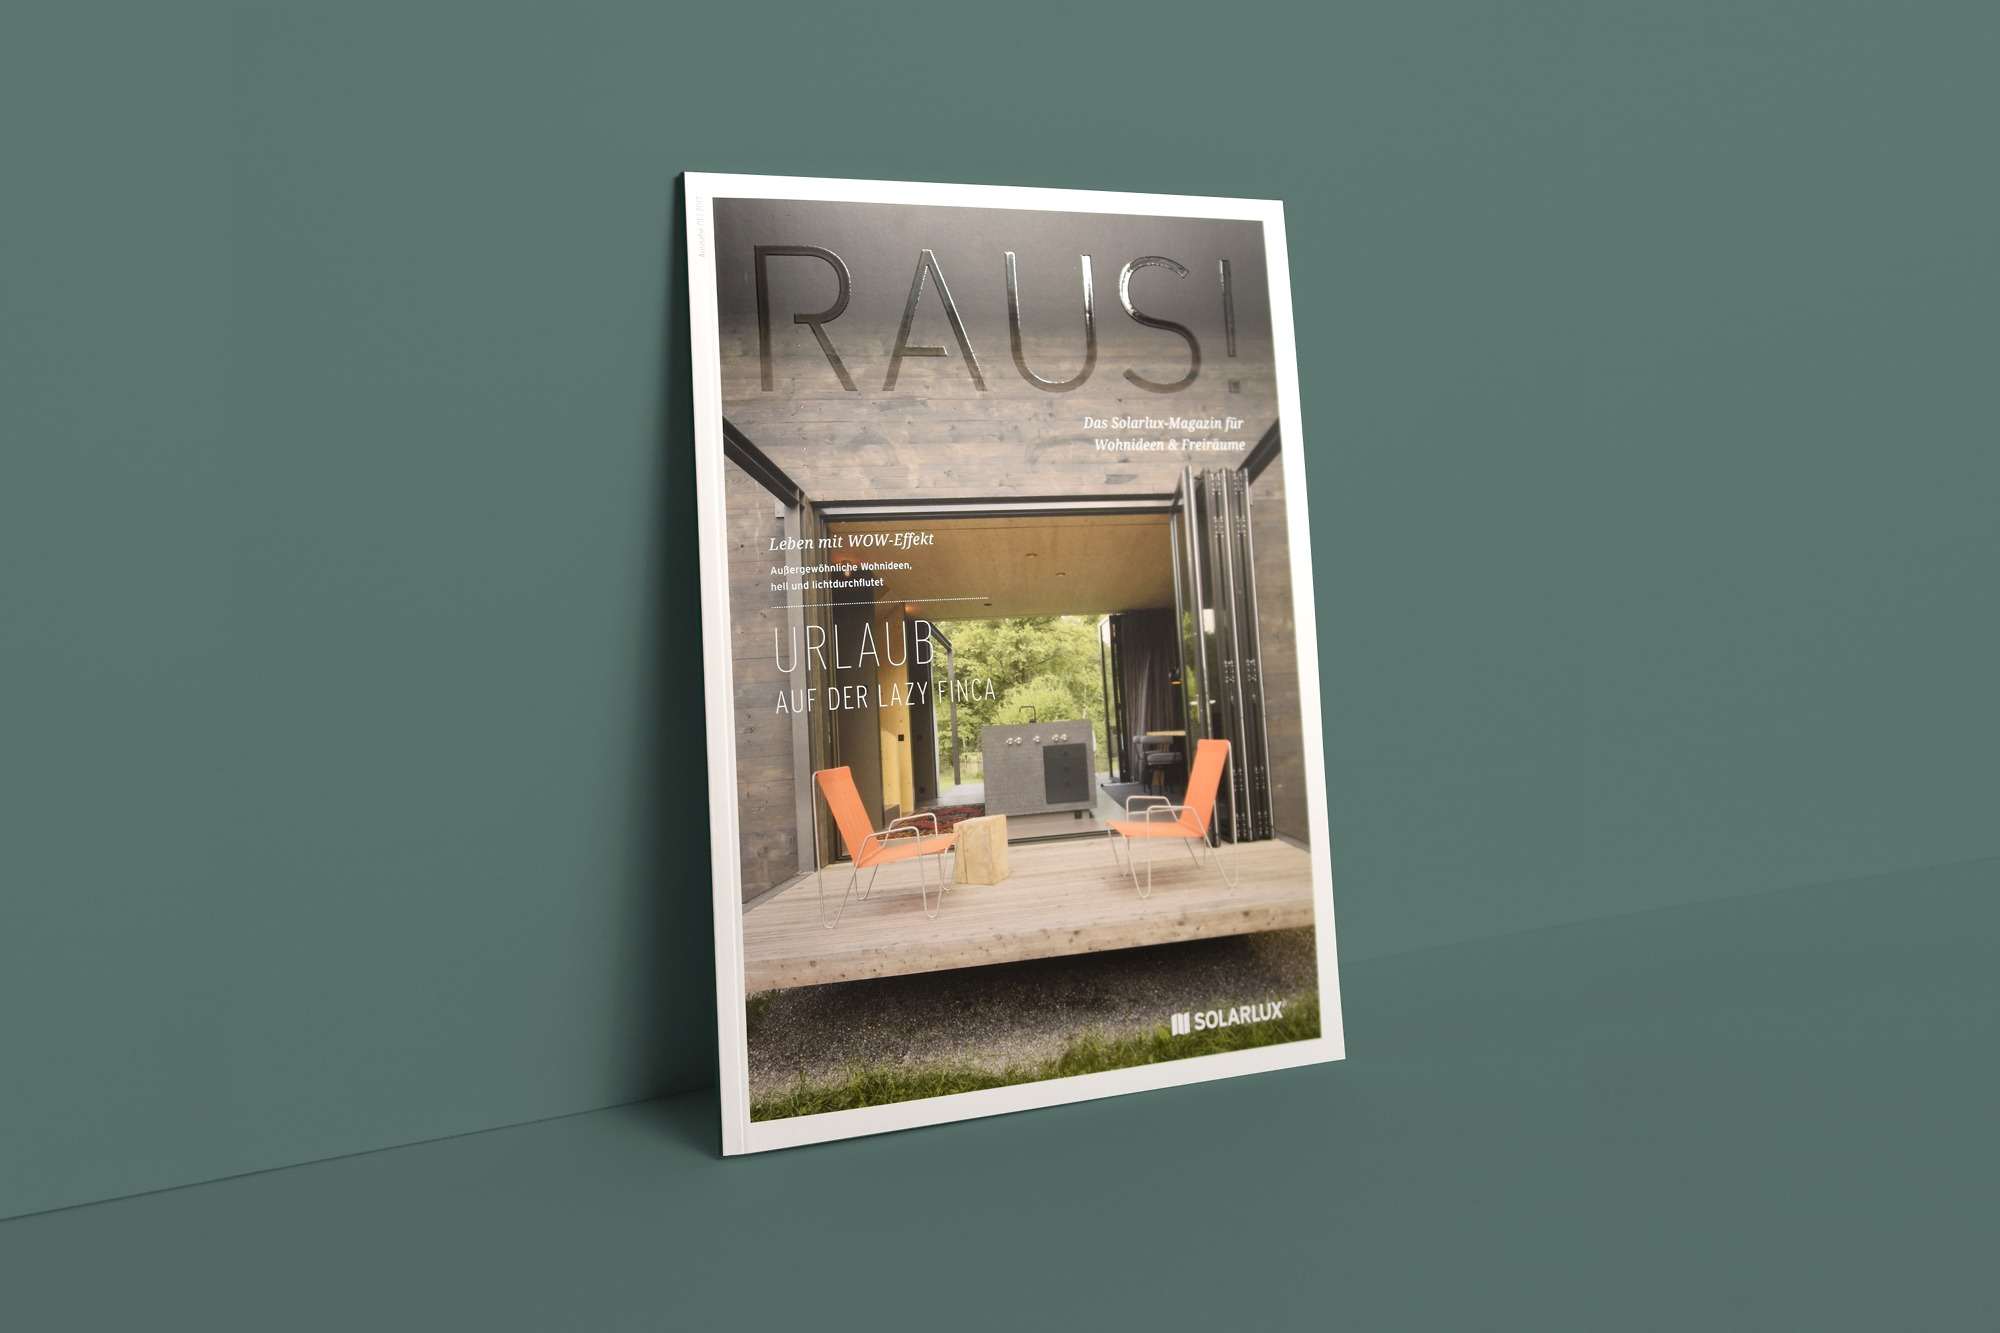 Studio dos, Grafikdesign Osnabrück, Solarlux Kundenmagazin Cover